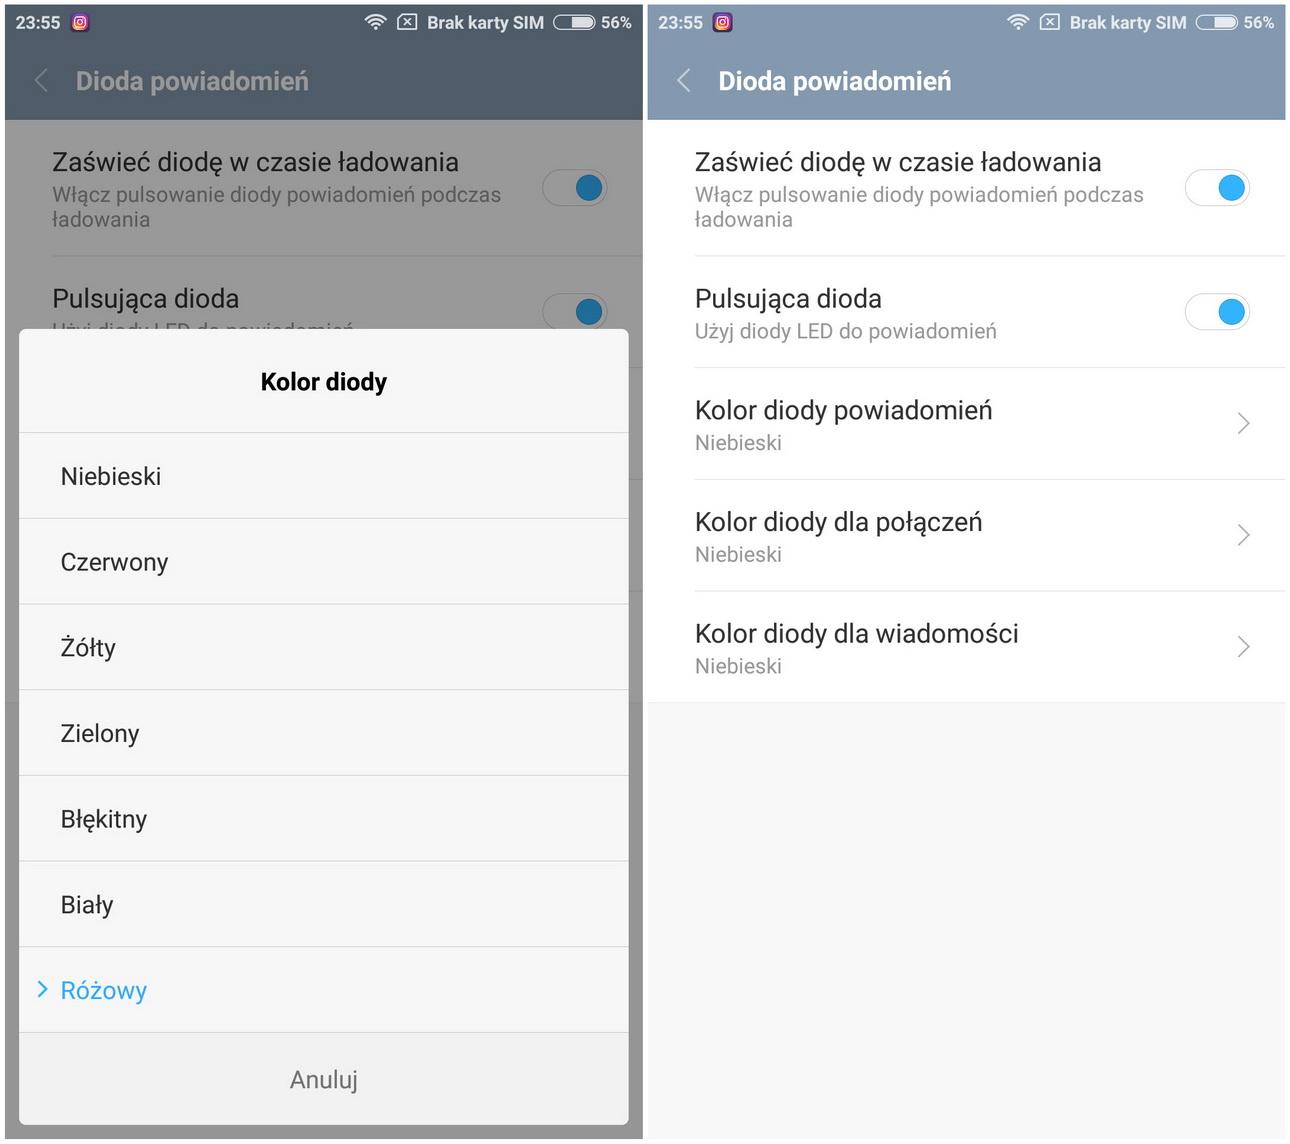 Xiaomi Mi5 - System. MIUI - recenzja 90sekund.pl